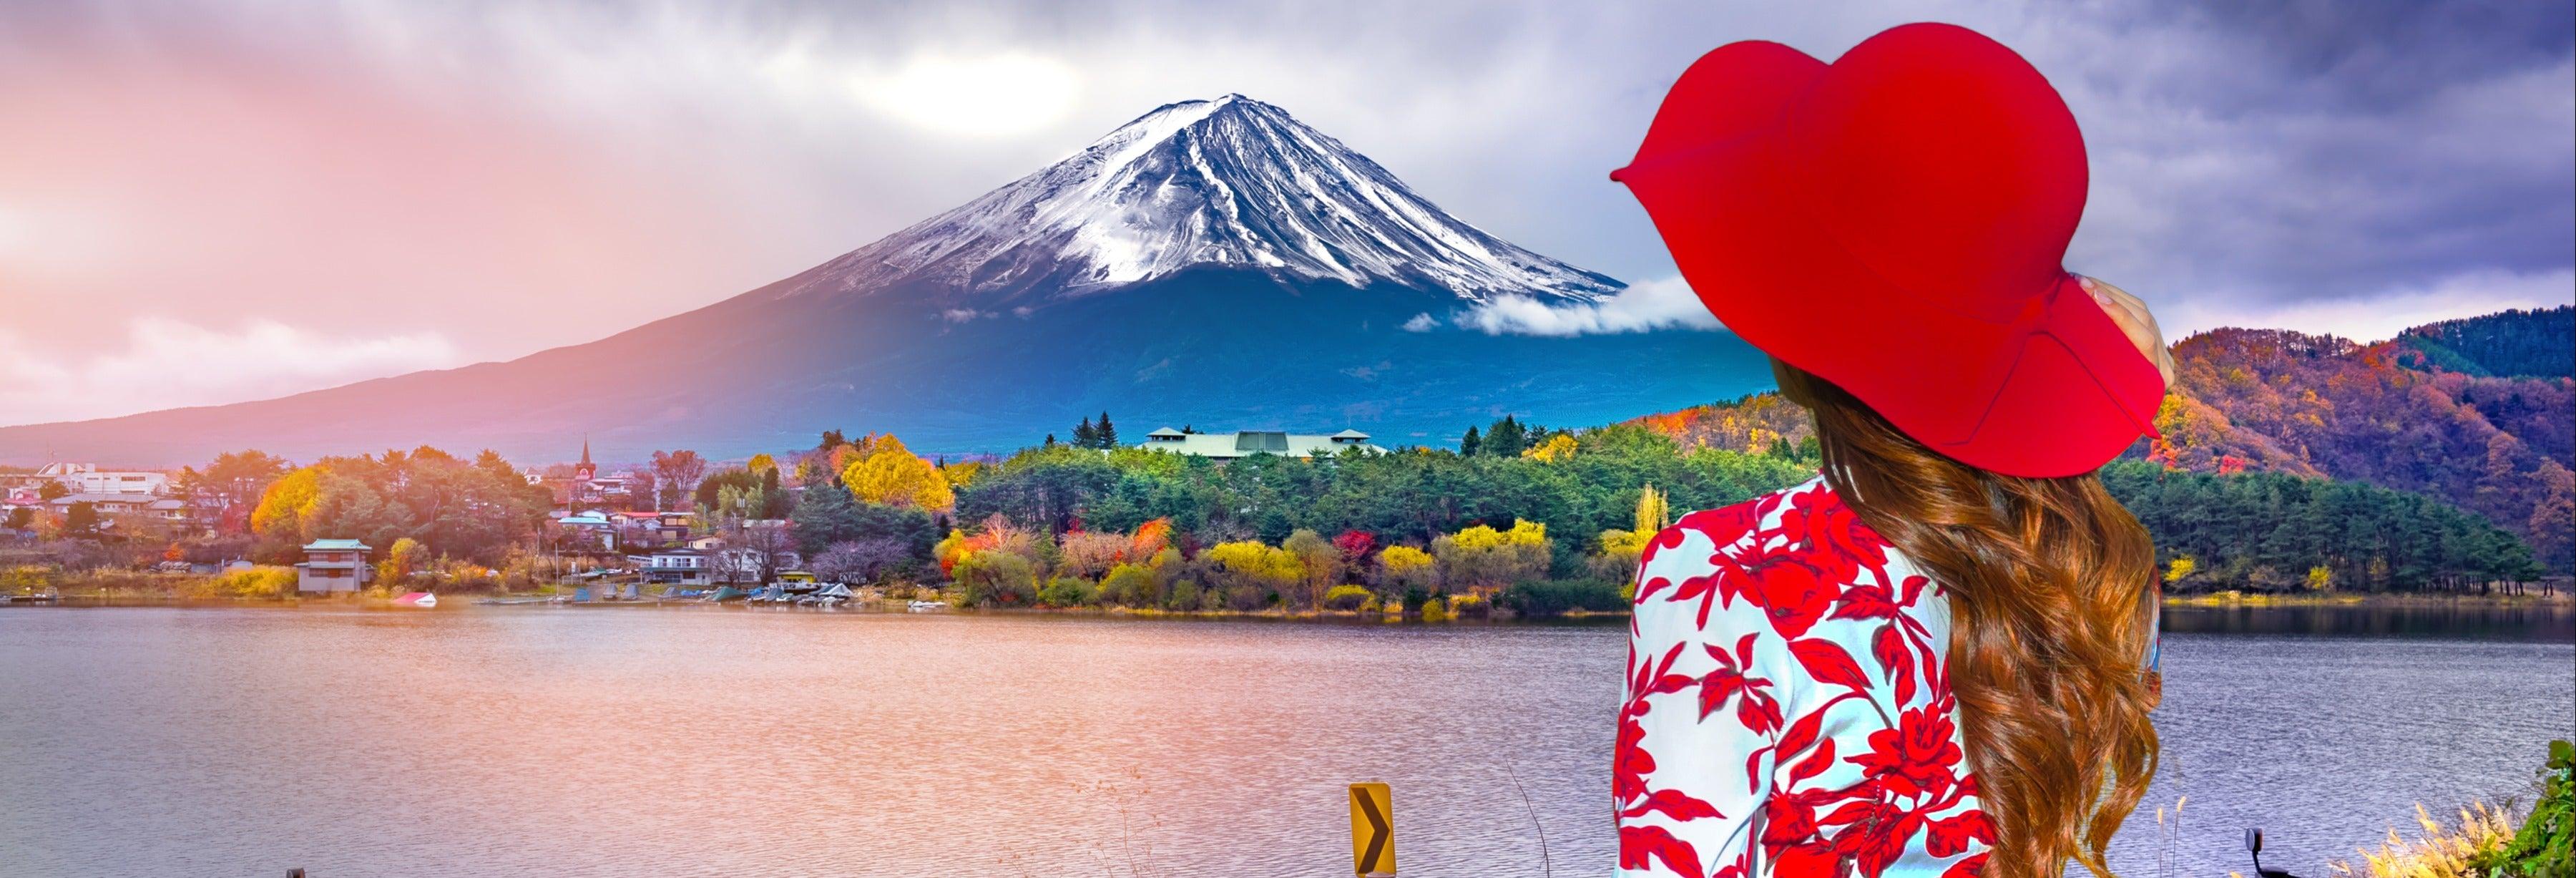 Monte Fuji, lago Kawaguchi y Gotemba Premium Outlets